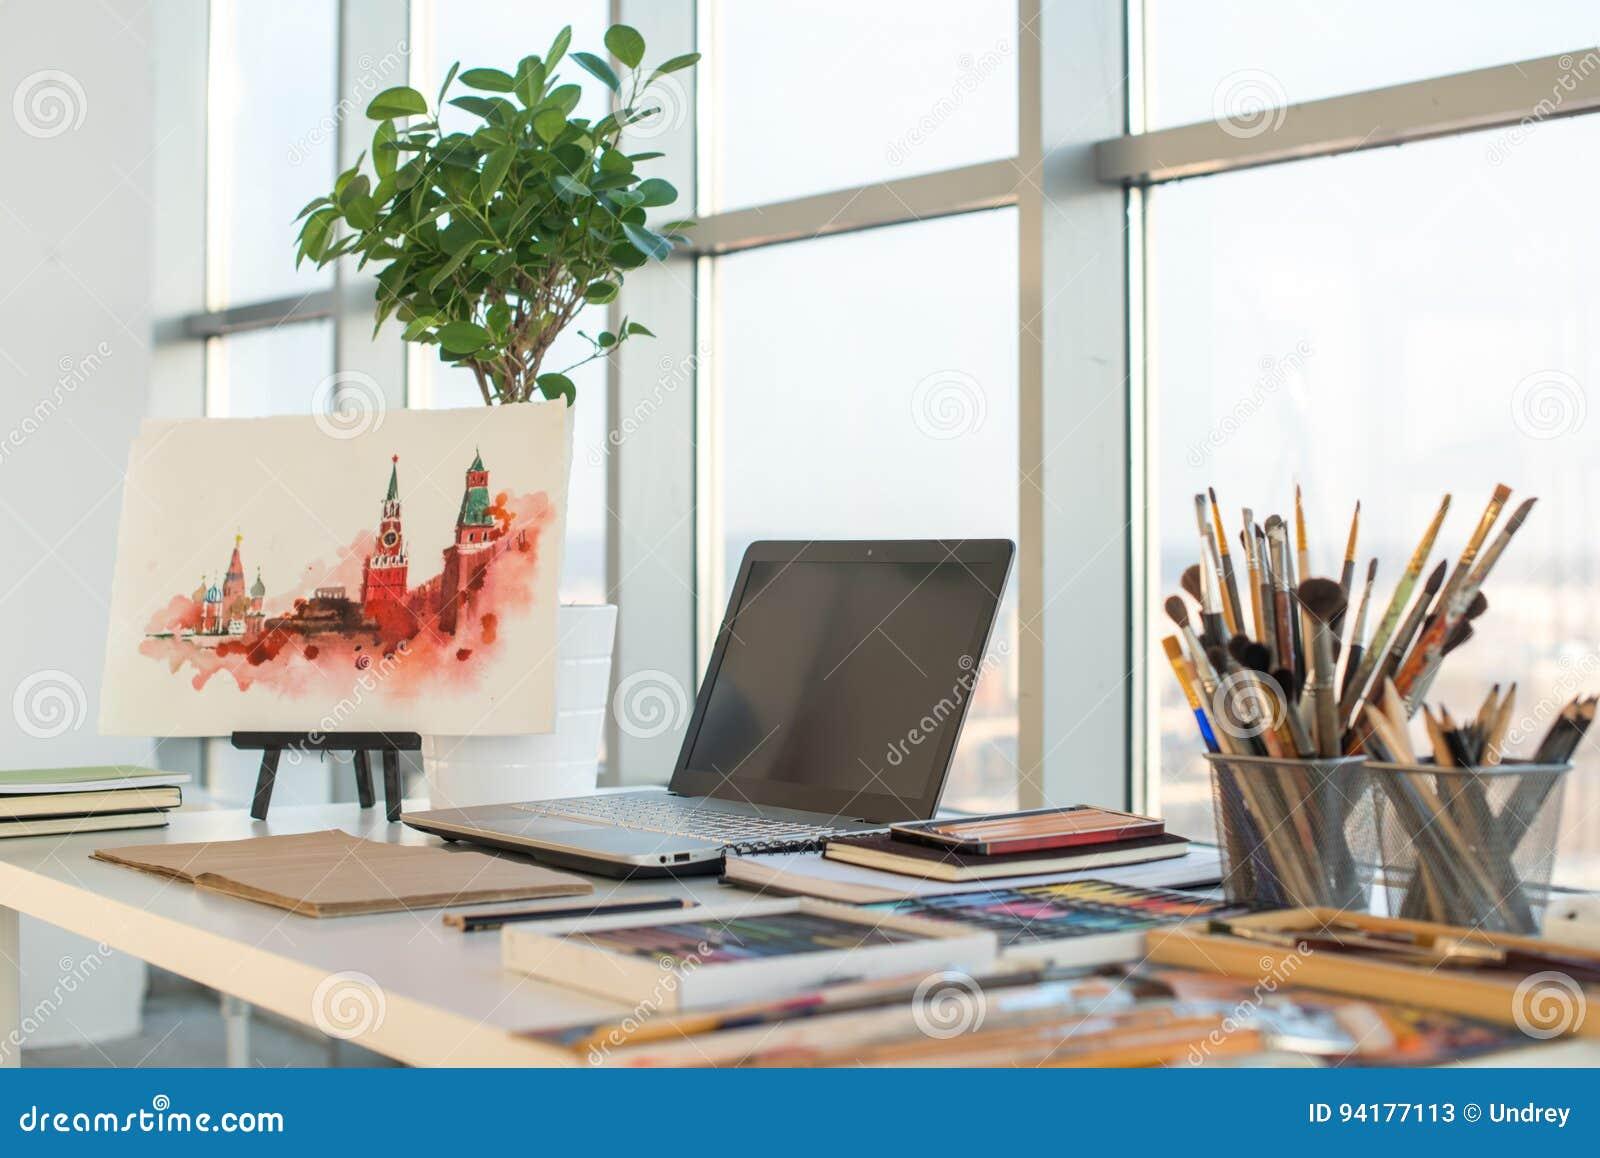 Concepteur artiste equipment dessin studio lieu travail